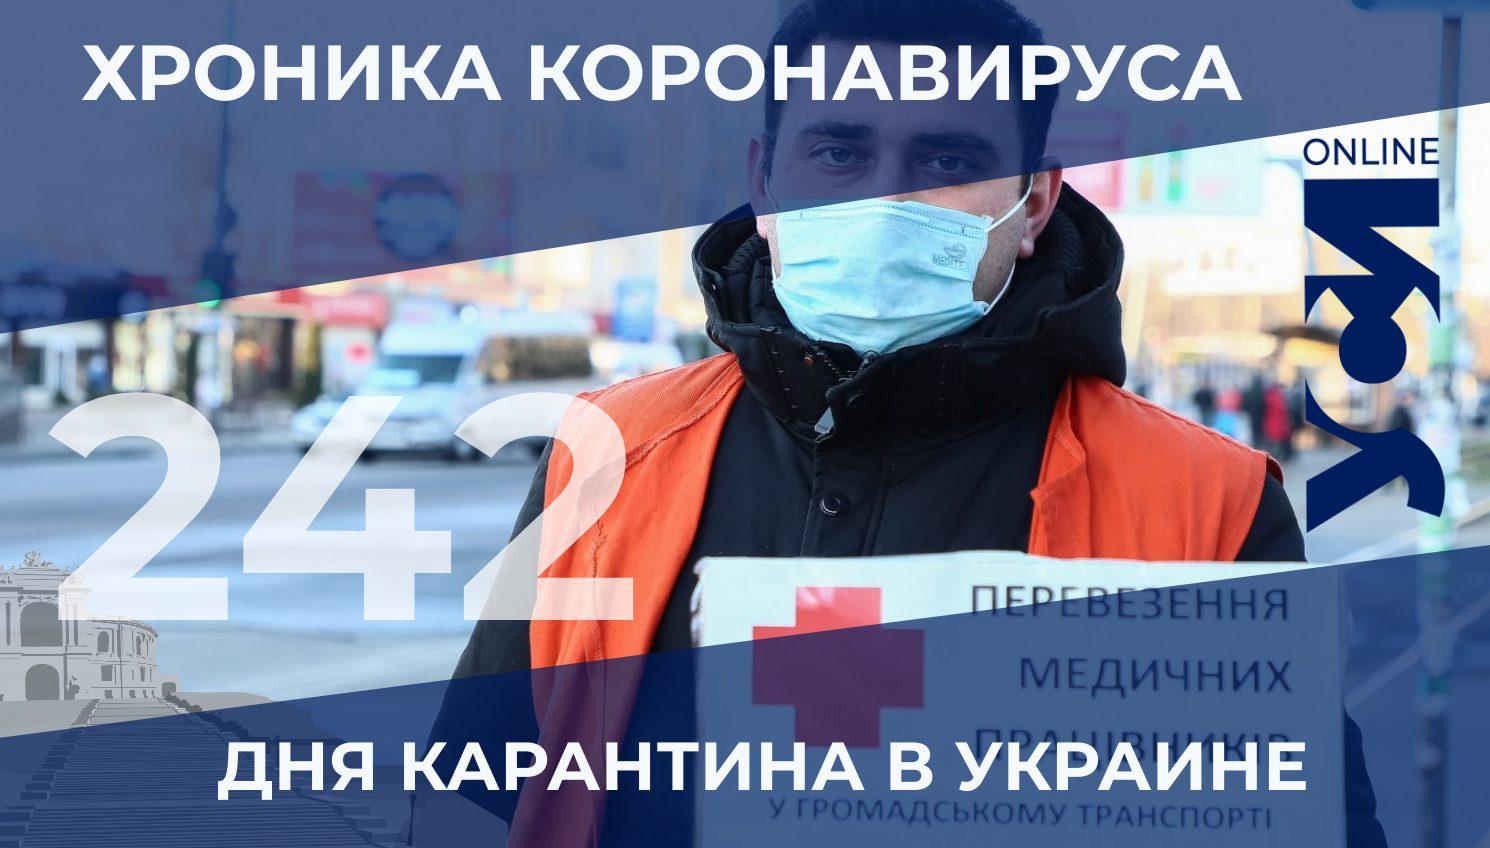 Хроника коронавируса: 242-й день карантина в Украине «фото»